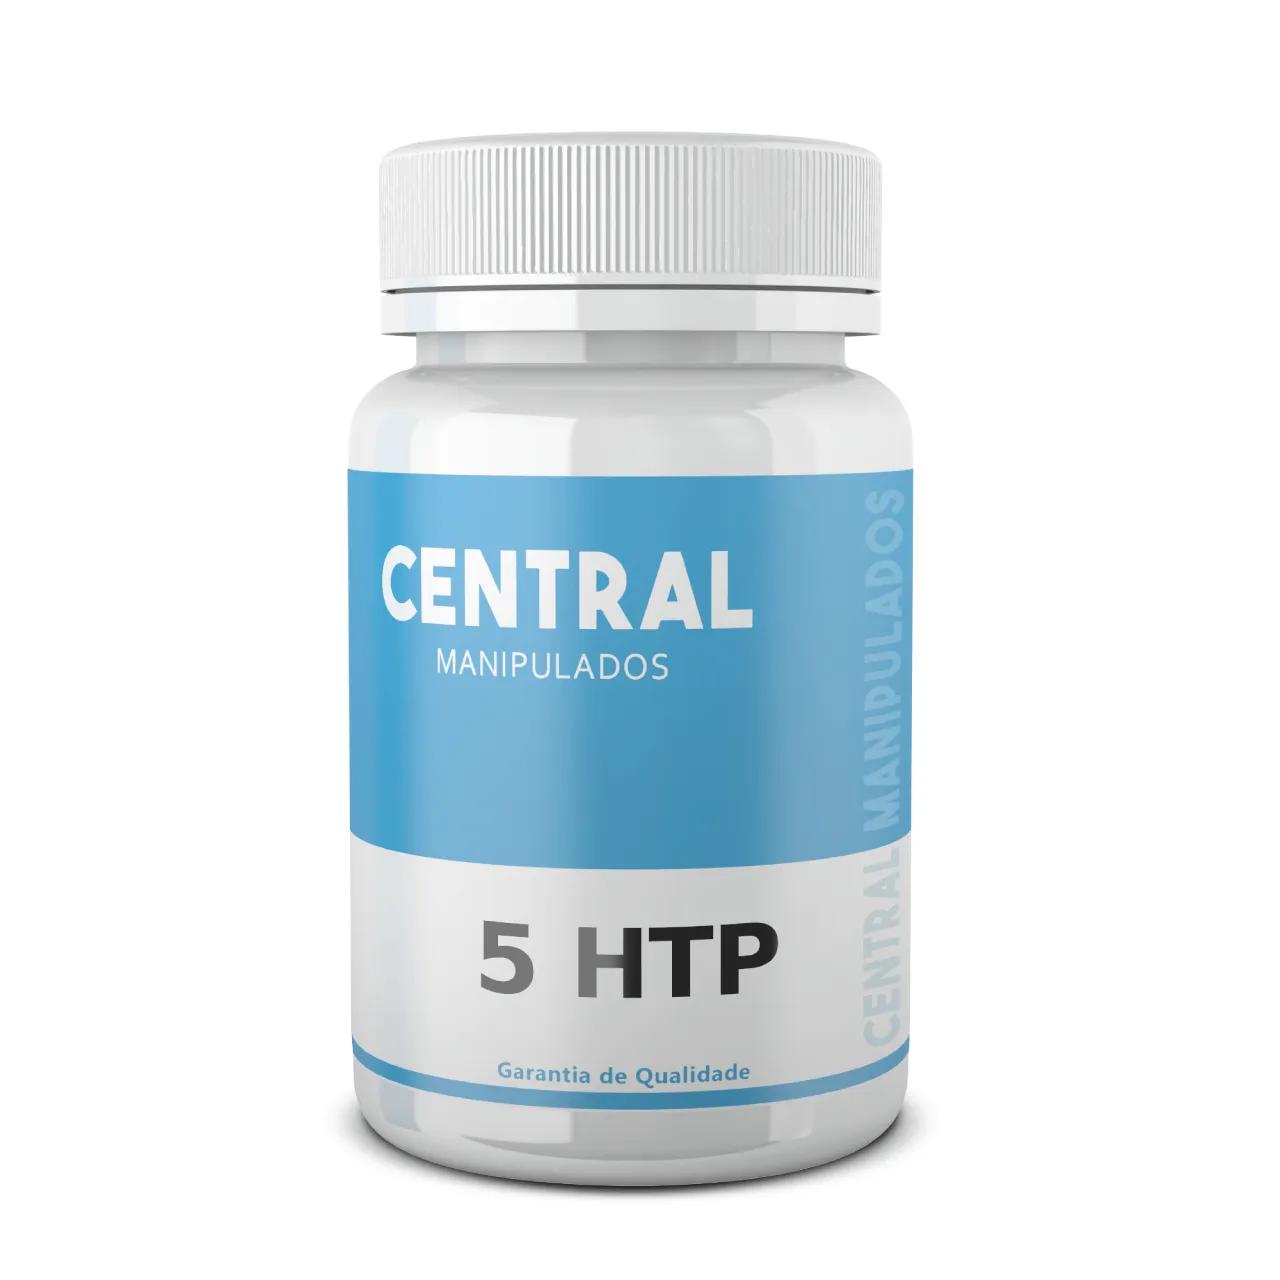 5 HTP 150mg - 30 cápsulas - Ansiolítico e antidepressivo natural